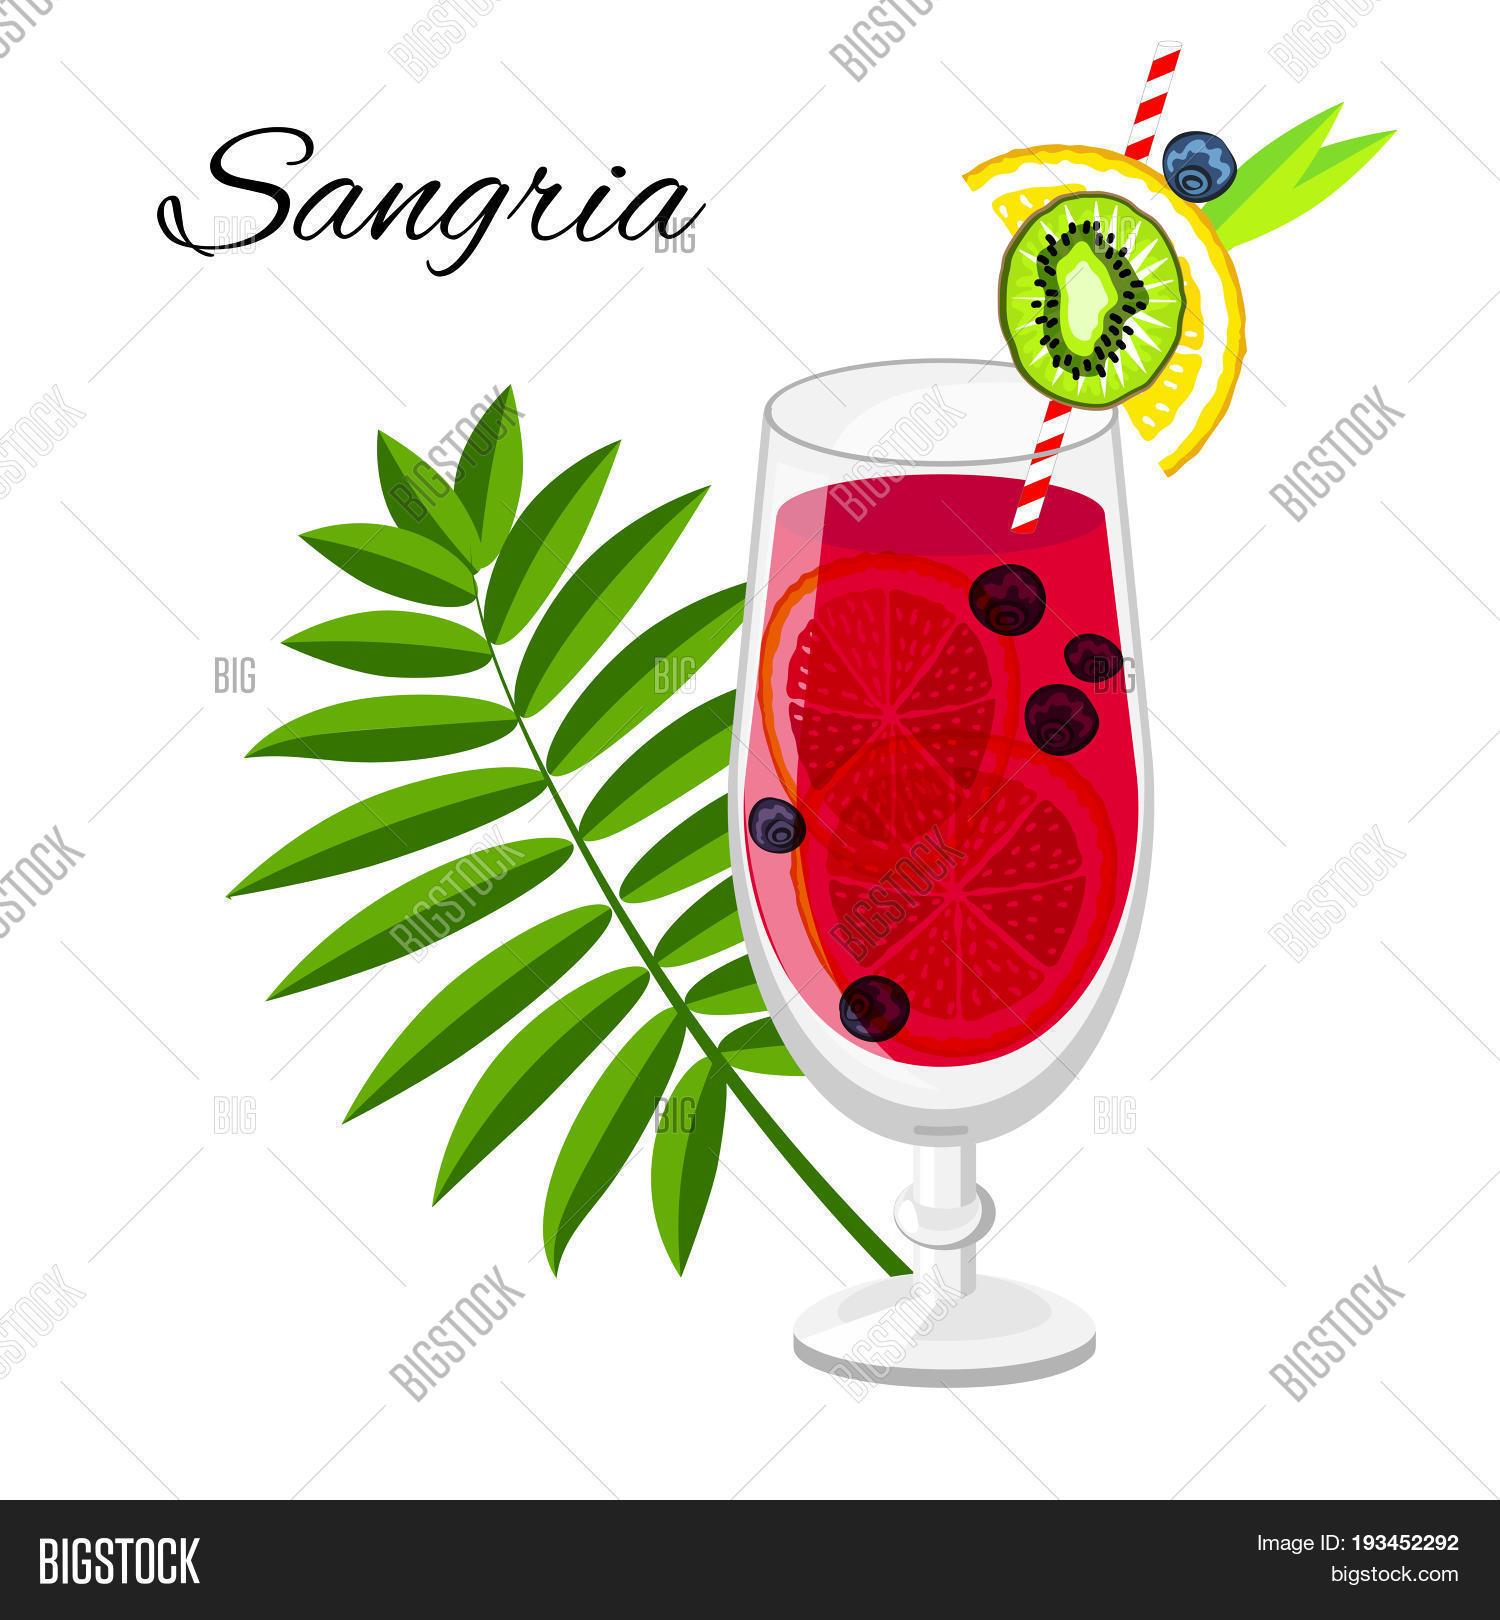 Sangria Fruit Cocktail Image Photo Free Trial Bigstock